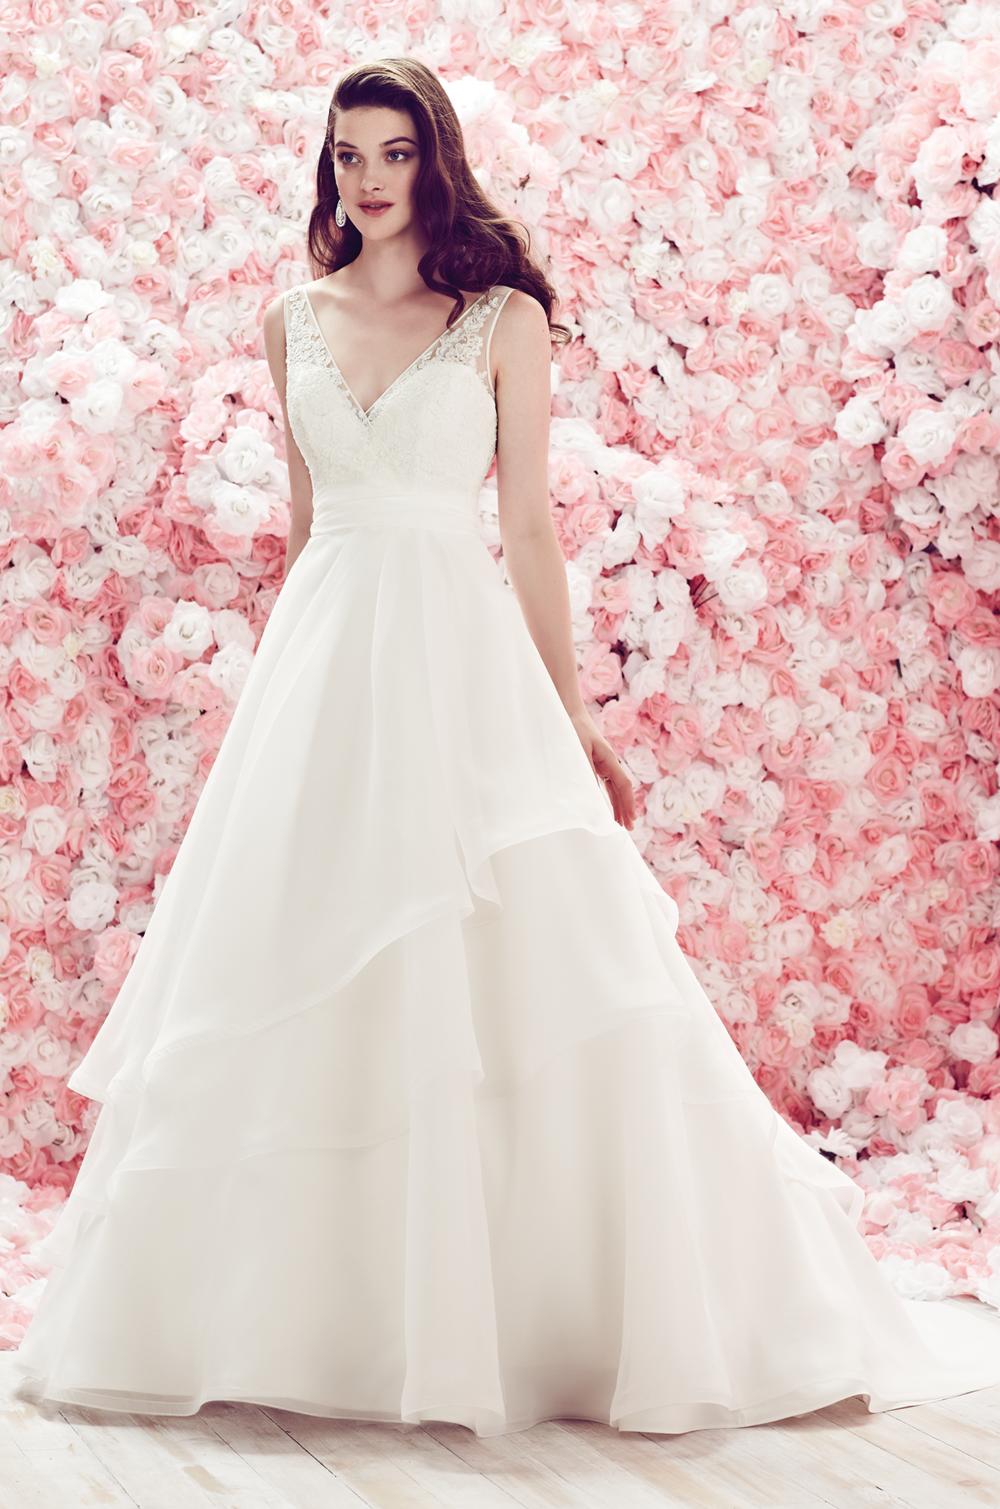 mikaella | Dresses | Pinterest | Wedding dress and Weddings